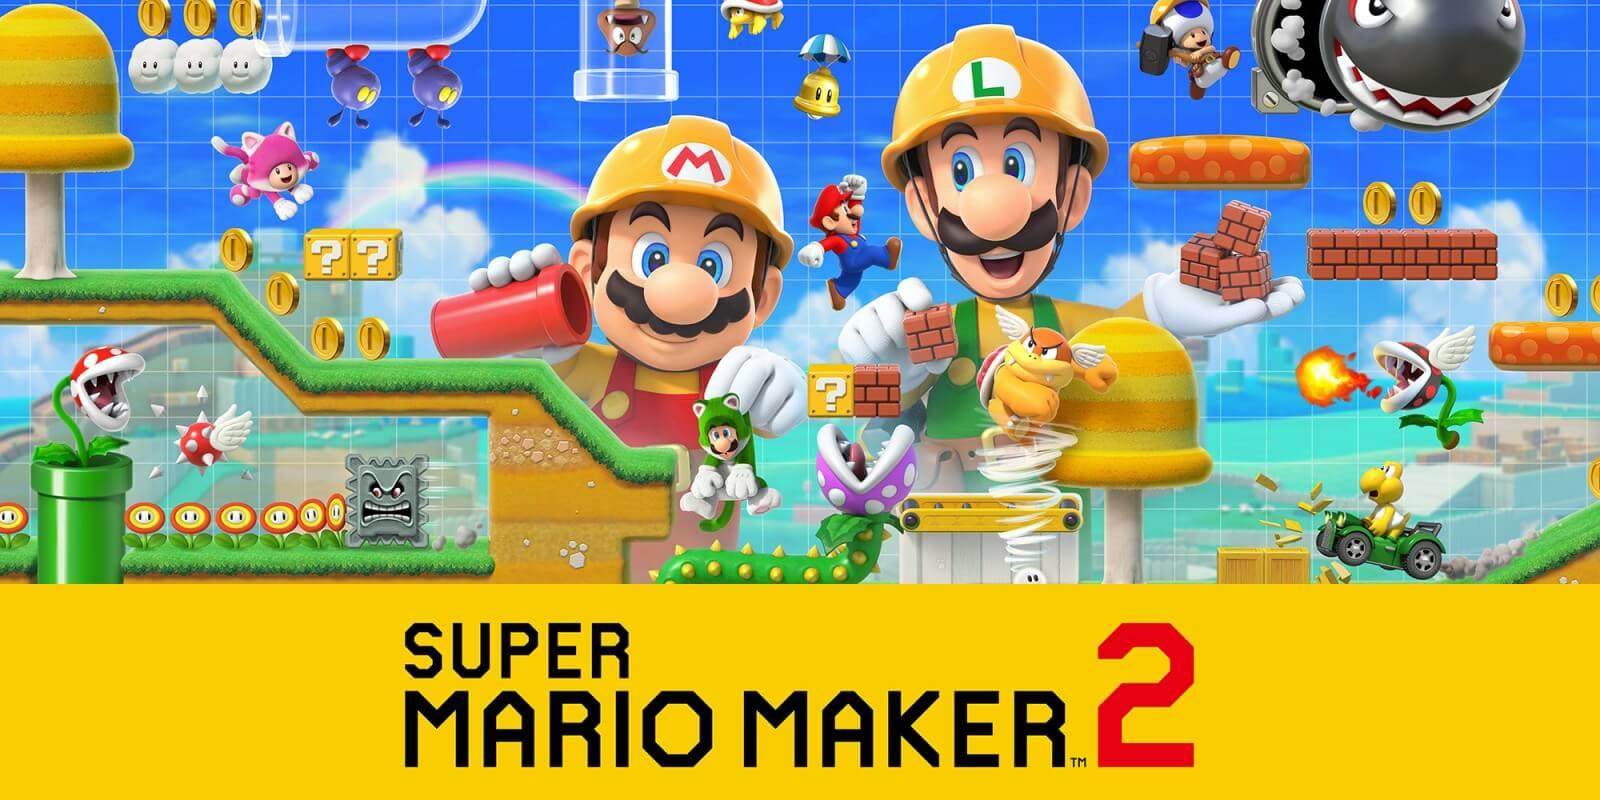 Multijugador Super Mario Maker 2